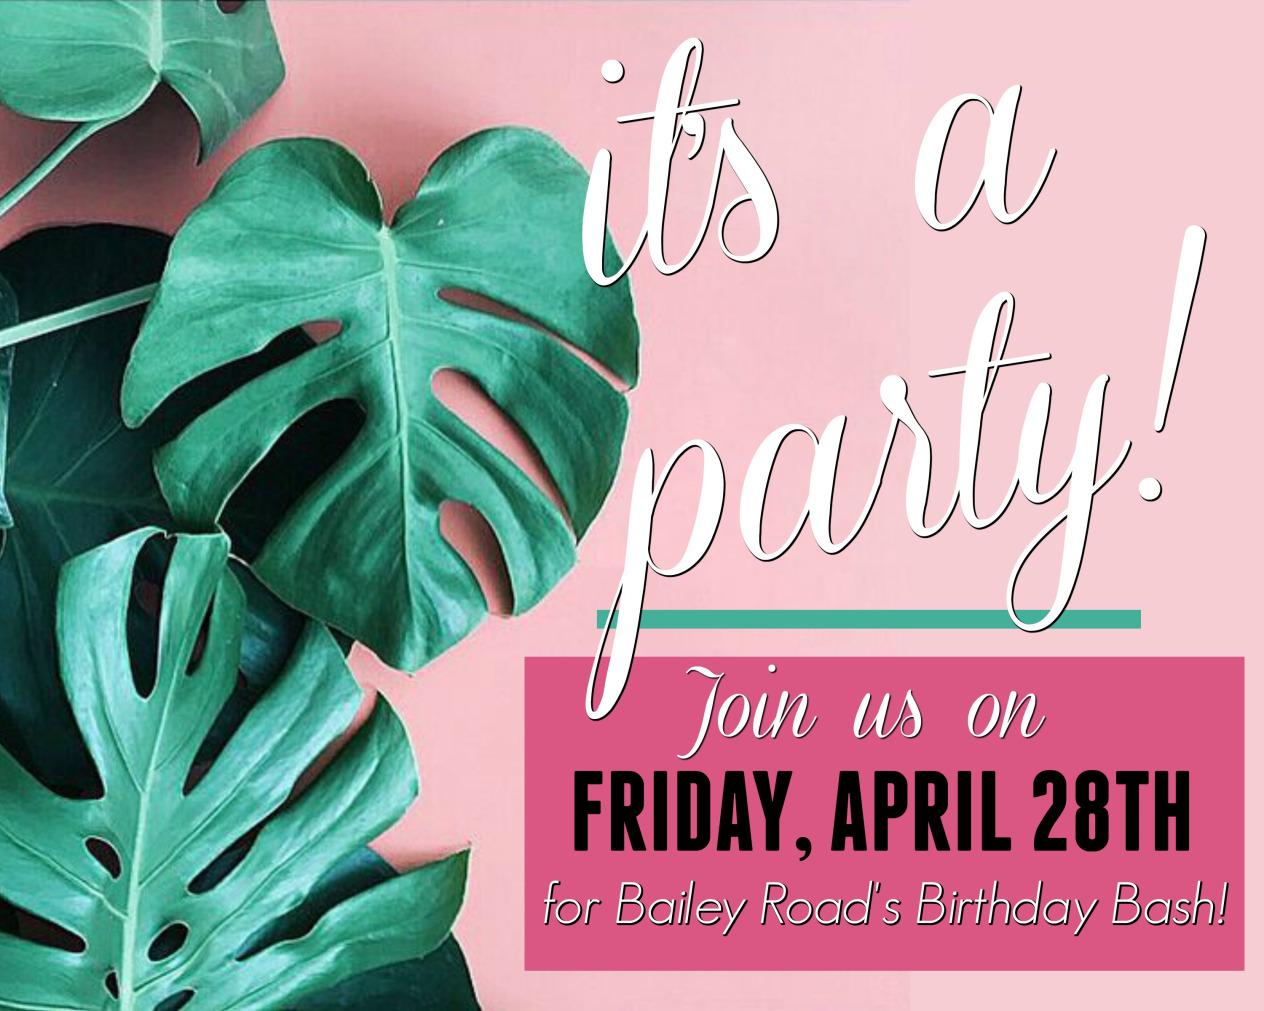 Birthday Event Invitation and marketing materials